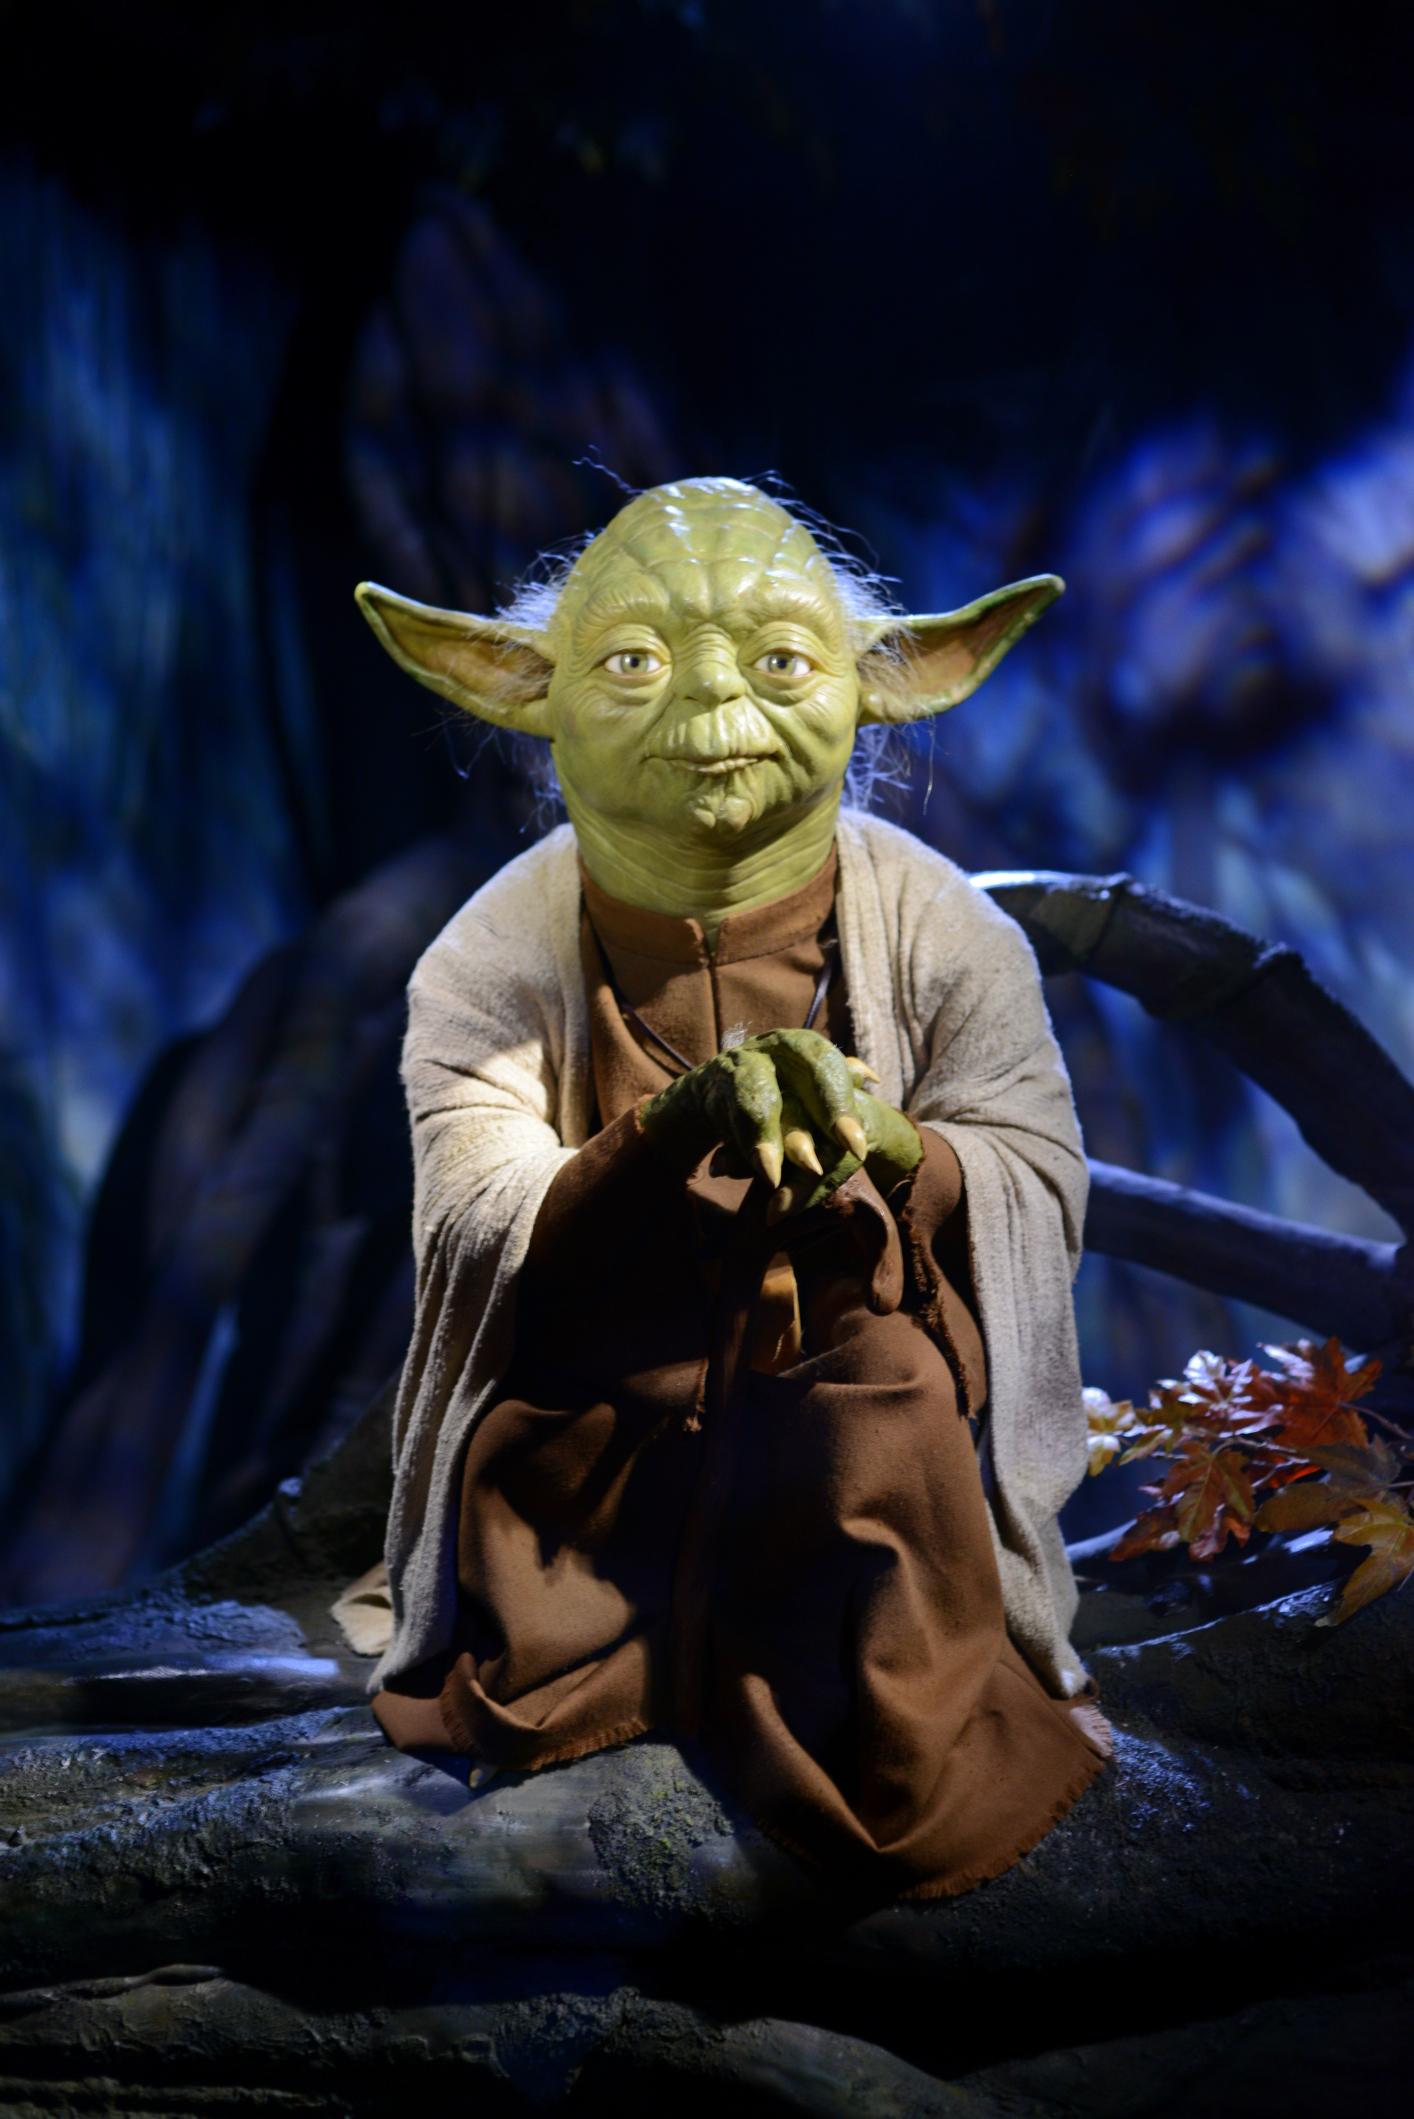 chickaDEE Magazine: Speak like Yoda